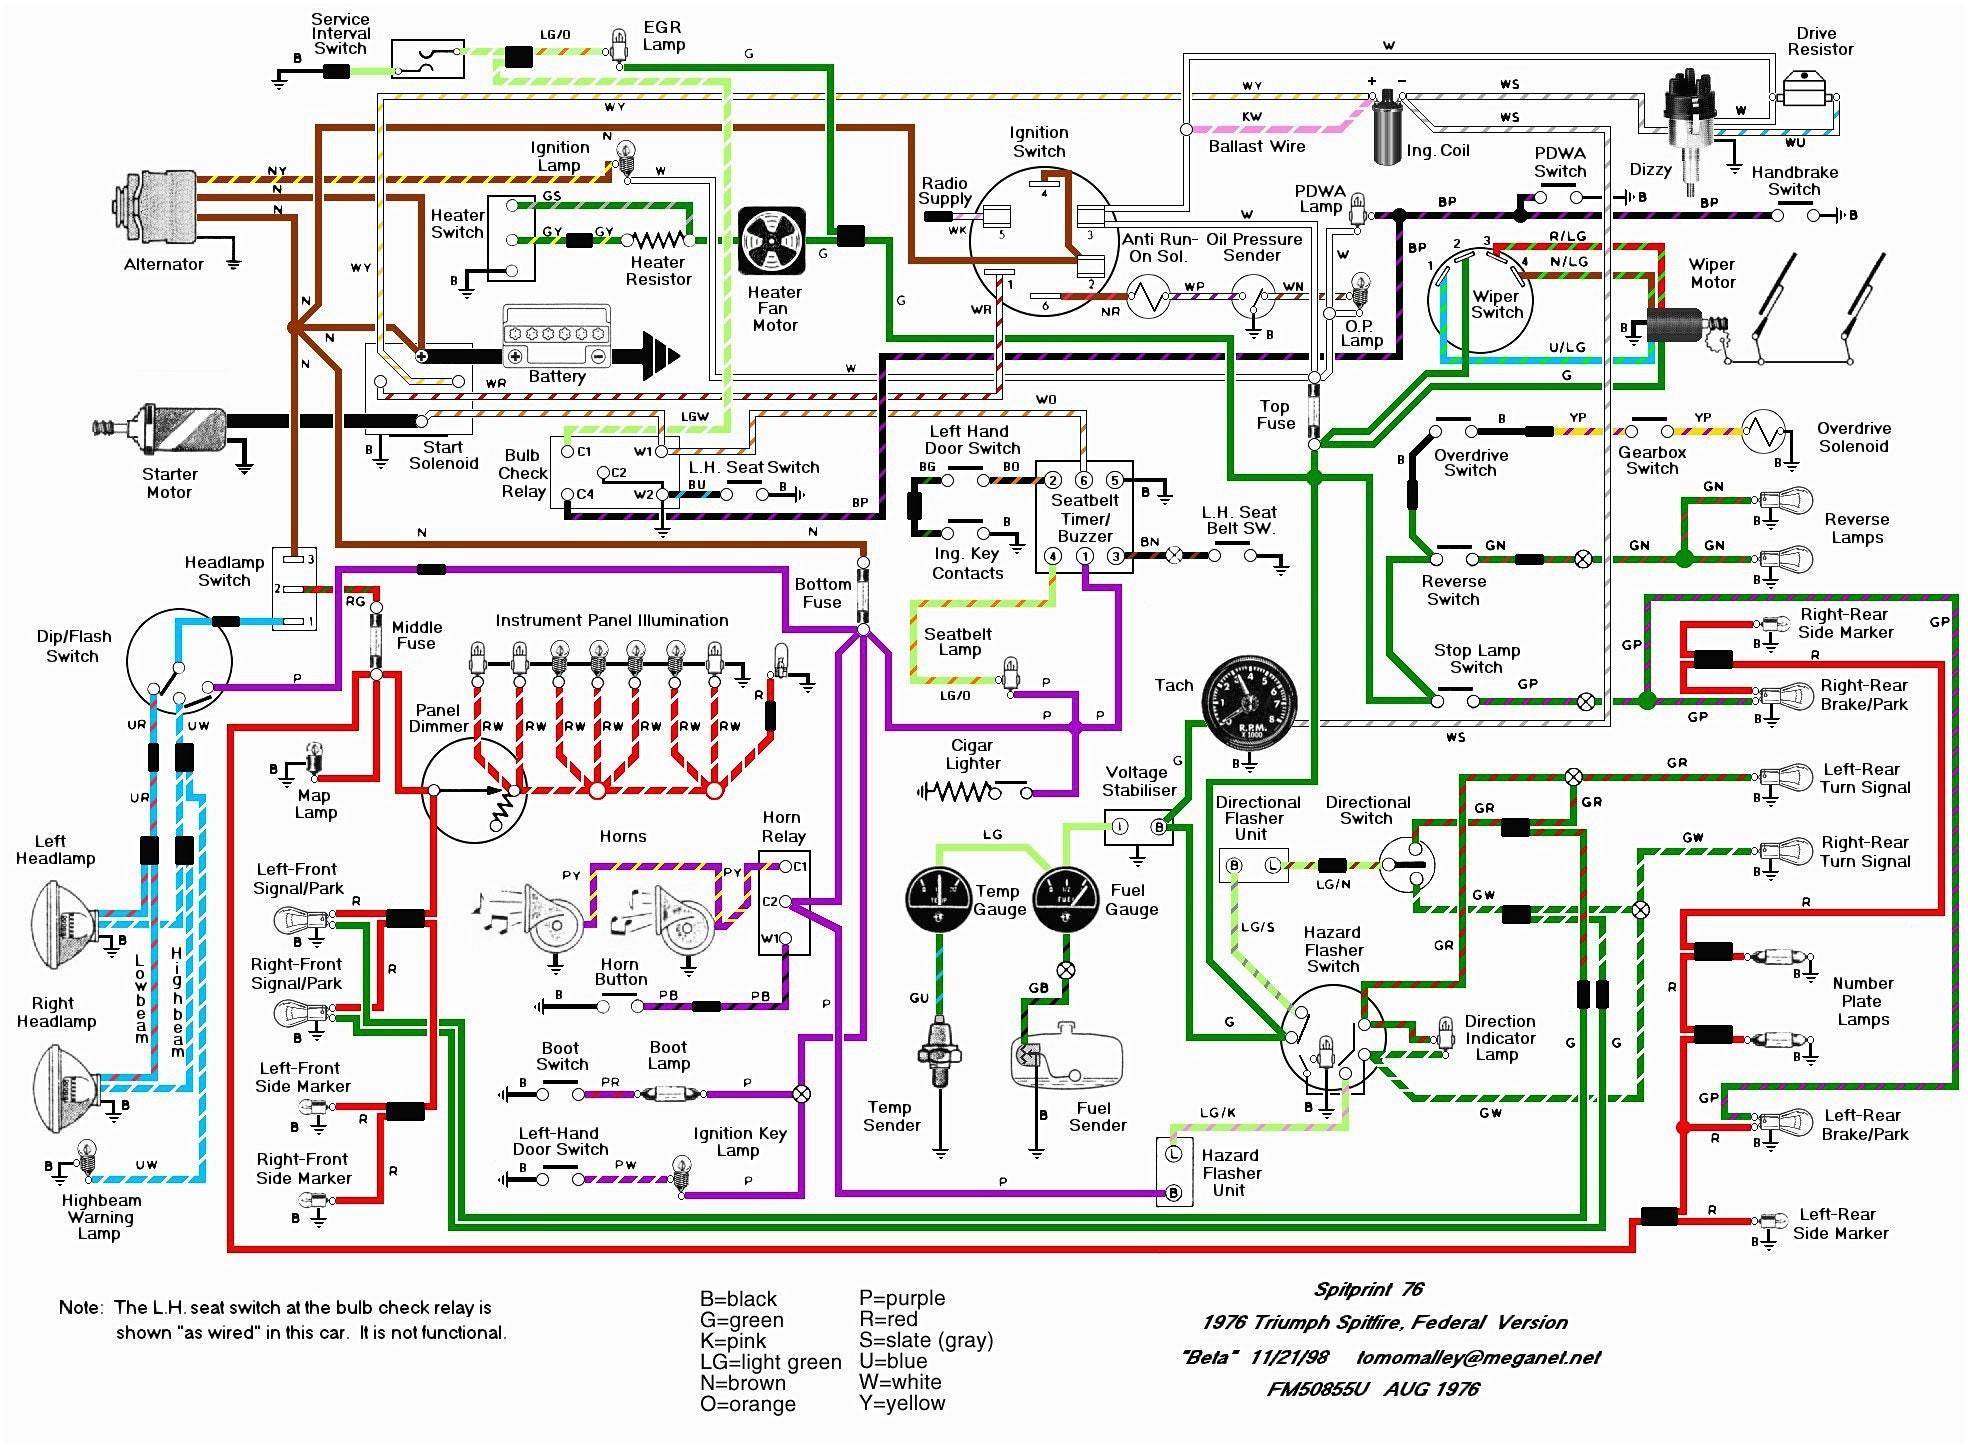 Diagram Att U Verse Gateway Modem Diagram Full Version Hd Quality Modem Diagram Diagramduck Ozeallunettes Fr